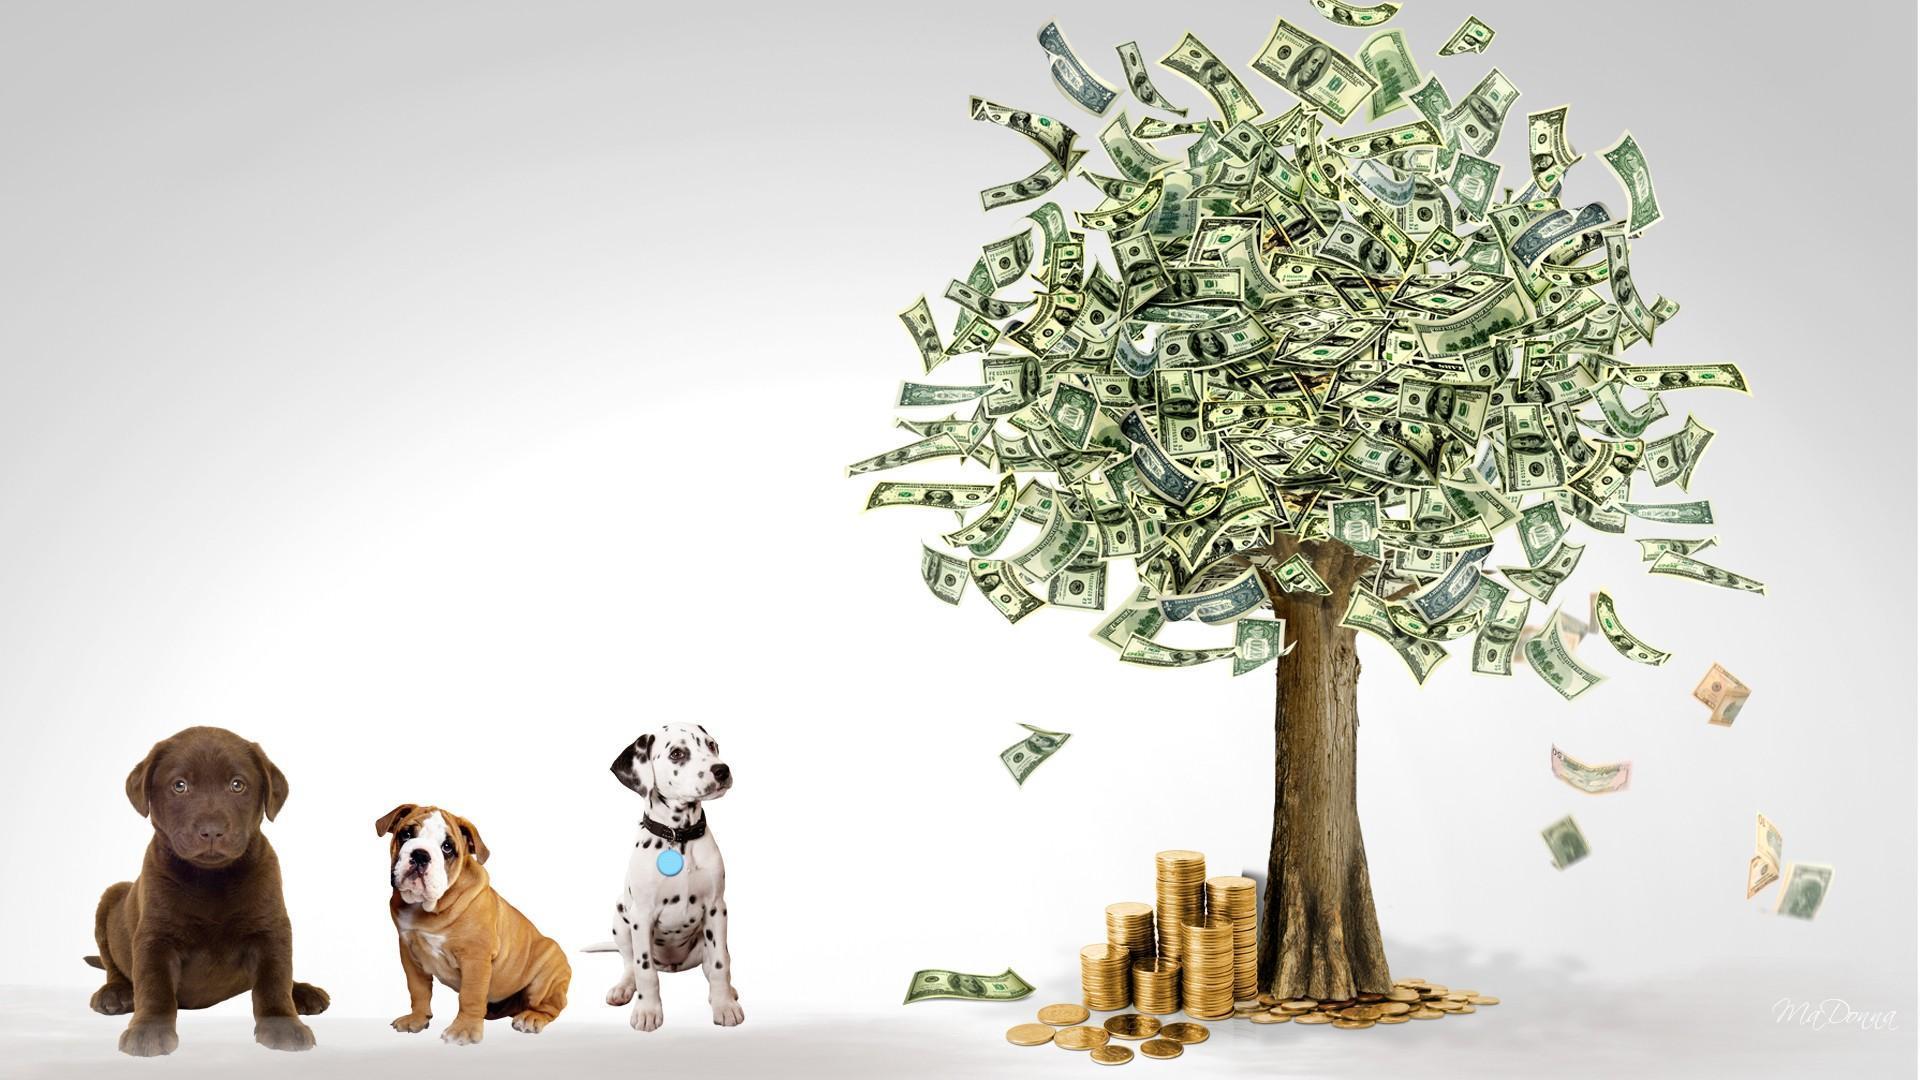 3d Stereoscopic Mural Wallpaper Money Tree Wallpaper Www Pixshark Com Images Galleries